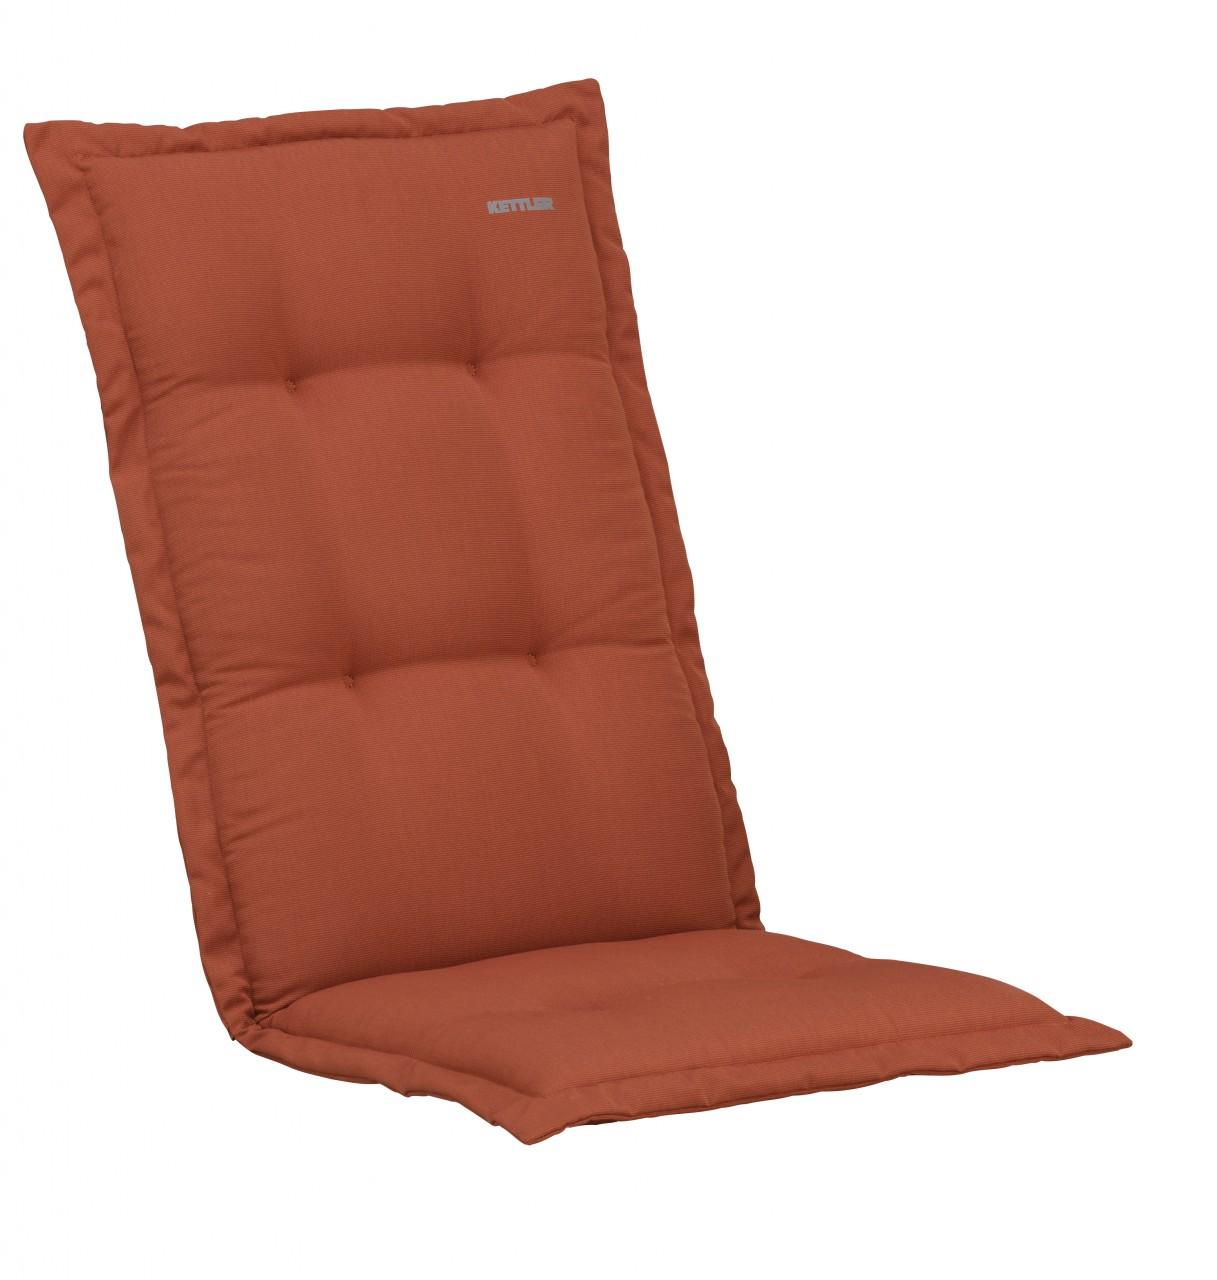 DESSIN 767 Sesselauflage für Vigo 122 x 50 x5,5 cm